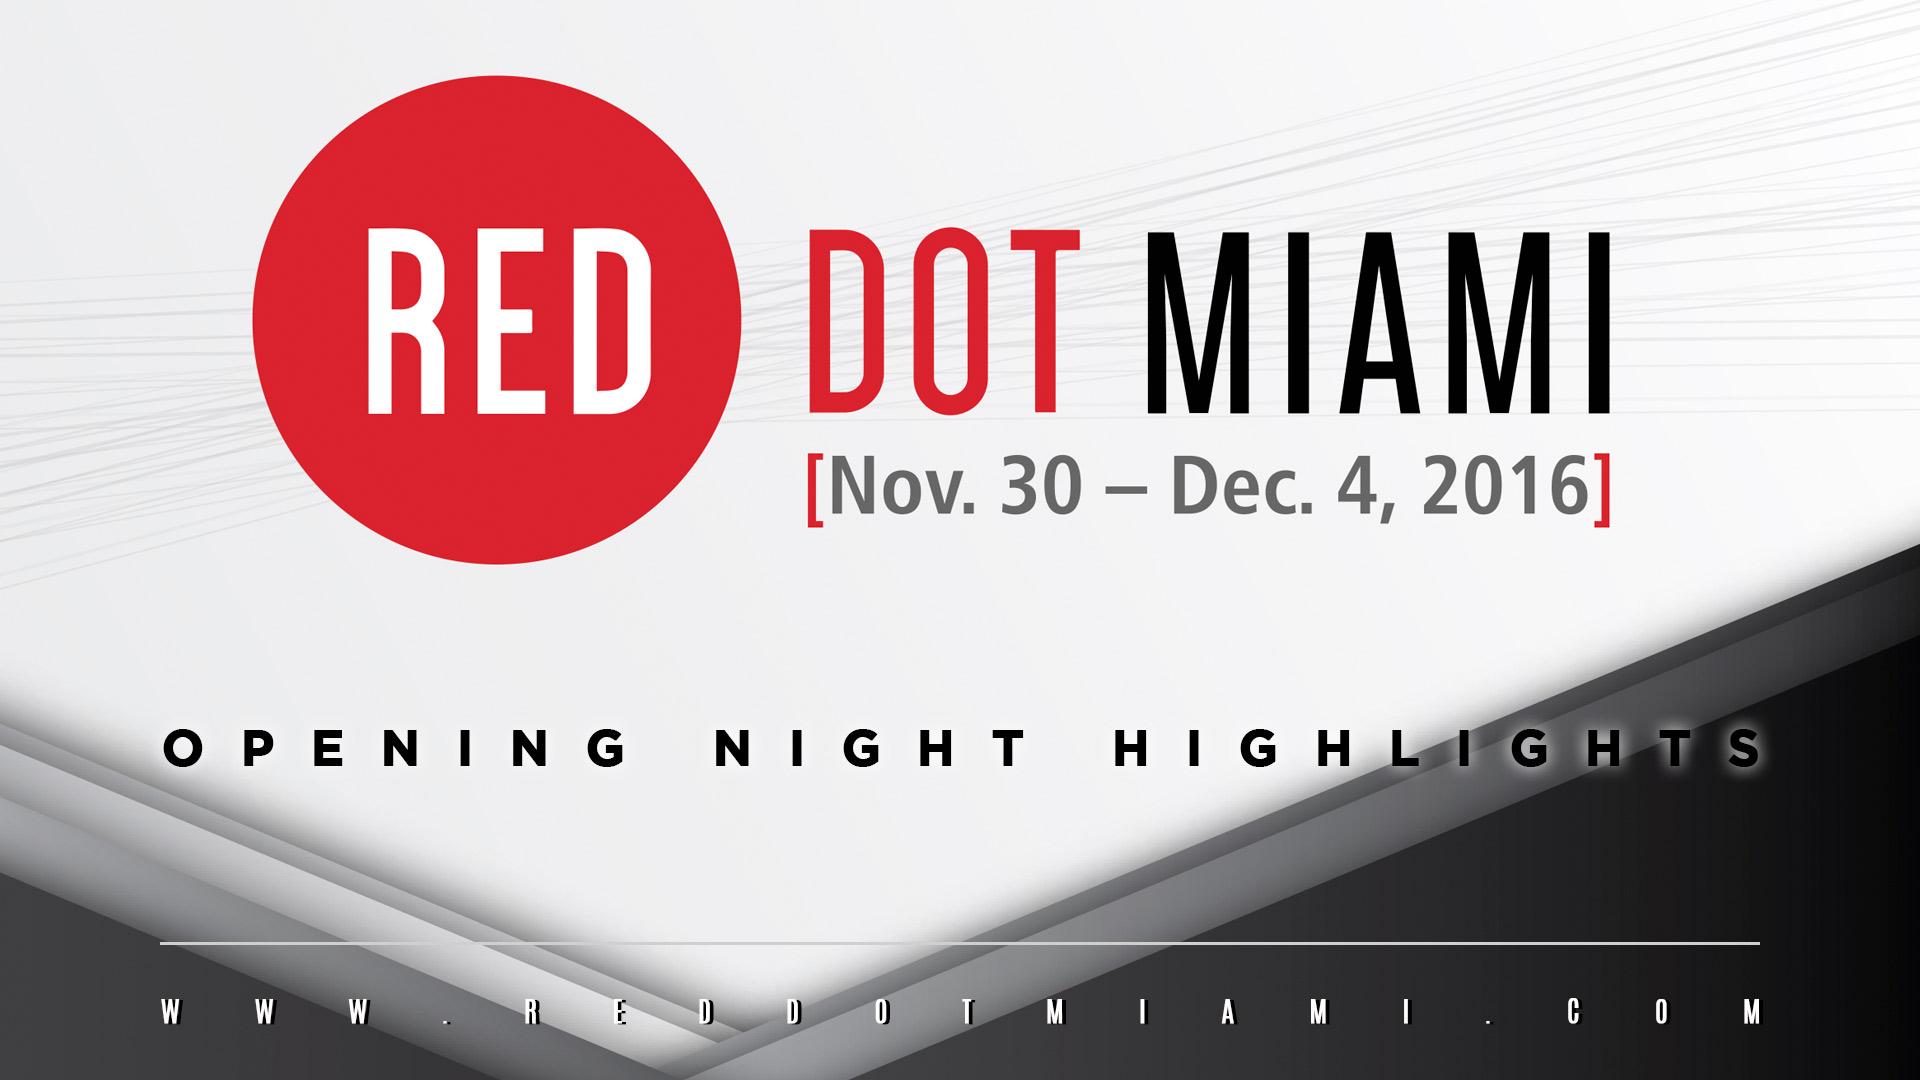 Red Dot Miami 2016 Opening Night